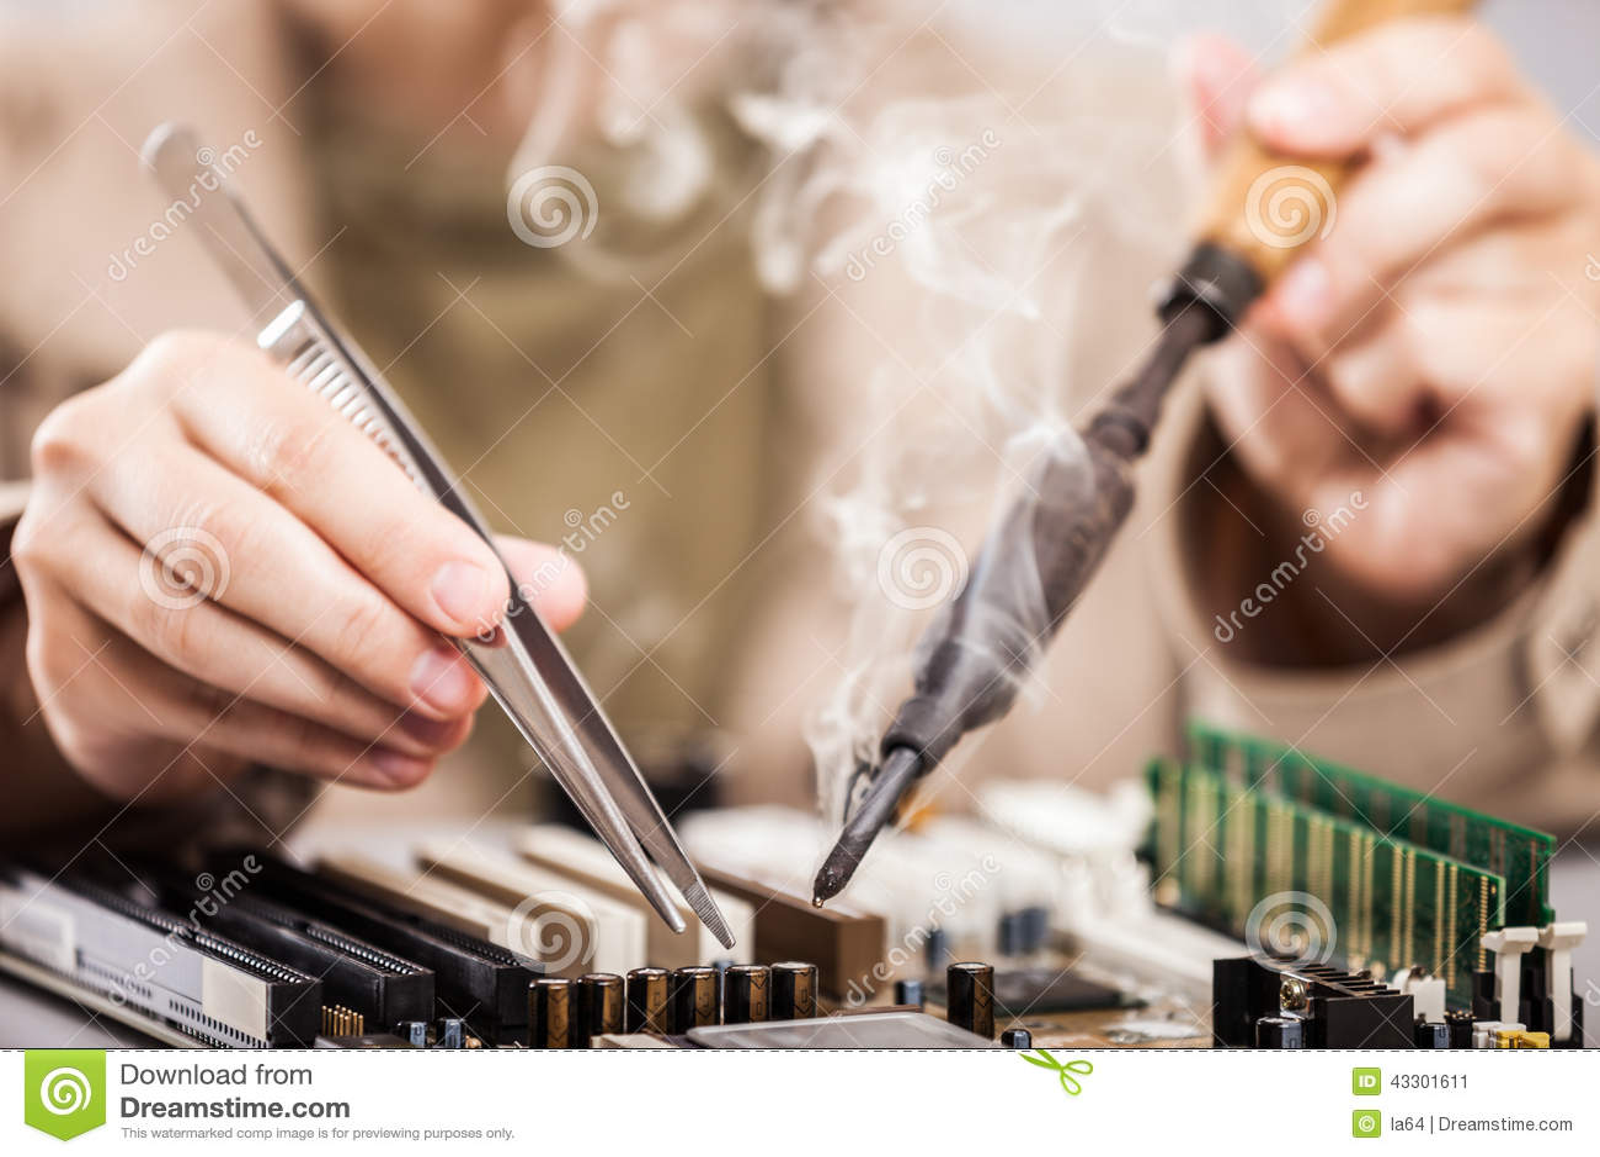 Human Hand Holding Soldering Iron Repairing Computer Circuit Boa Board Royalty Free Stock Photo Image